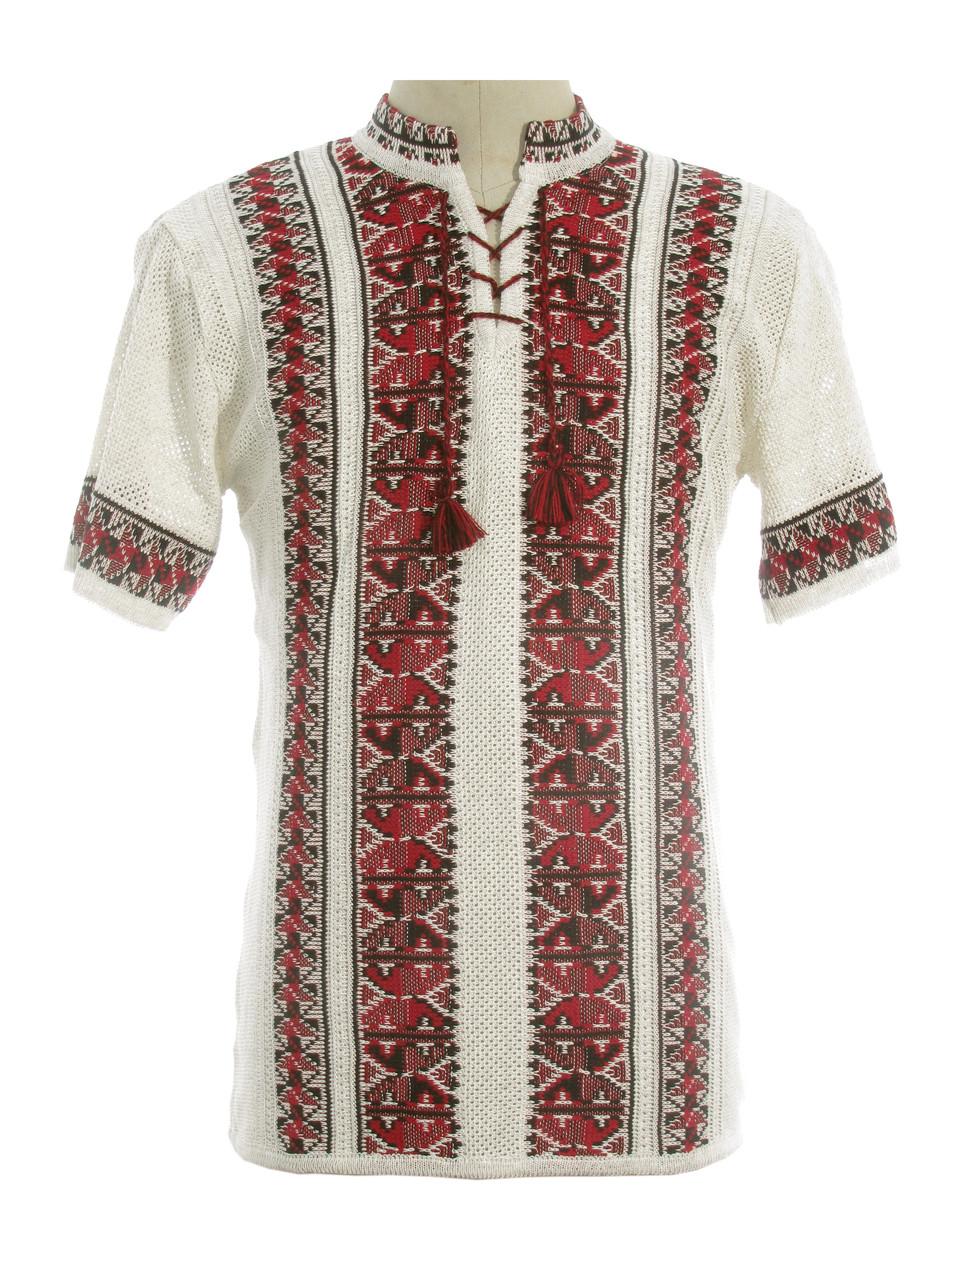 Мужская вязаная рубашка 20275 (короткий рукав)